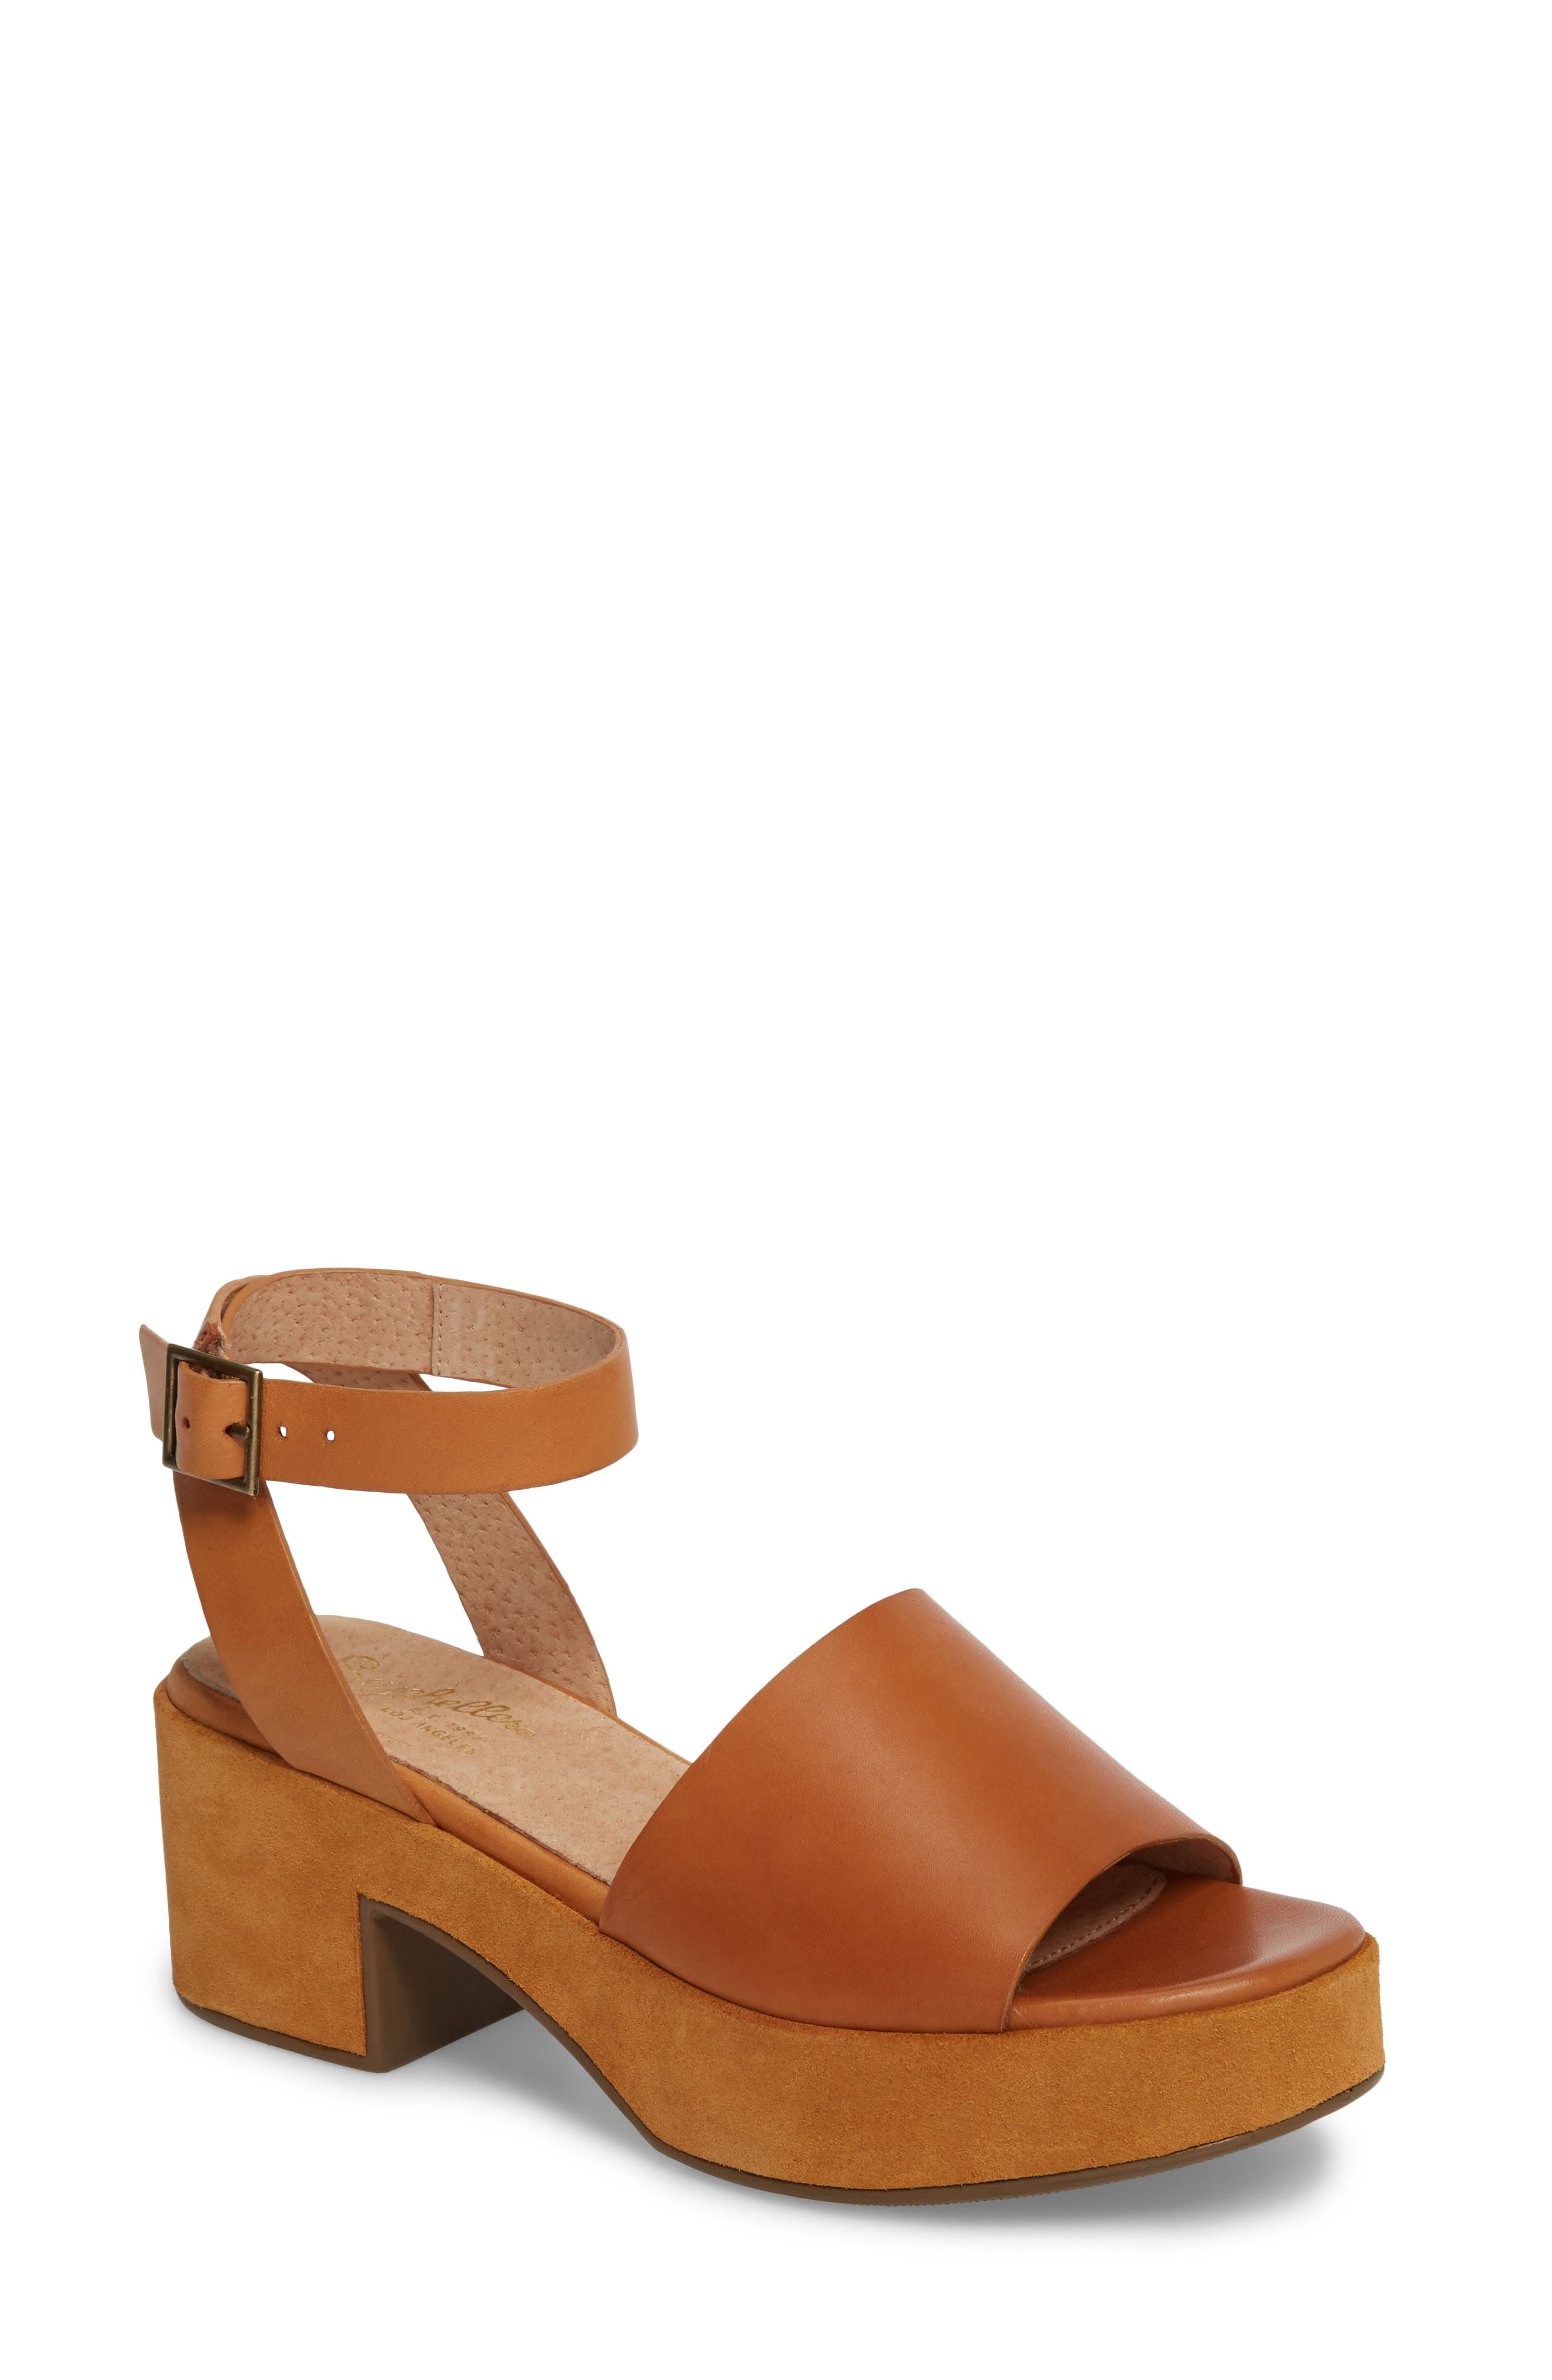 Calming Influence Platform Sandal,                             Main thumbnail 1, color,                             Tan Leather